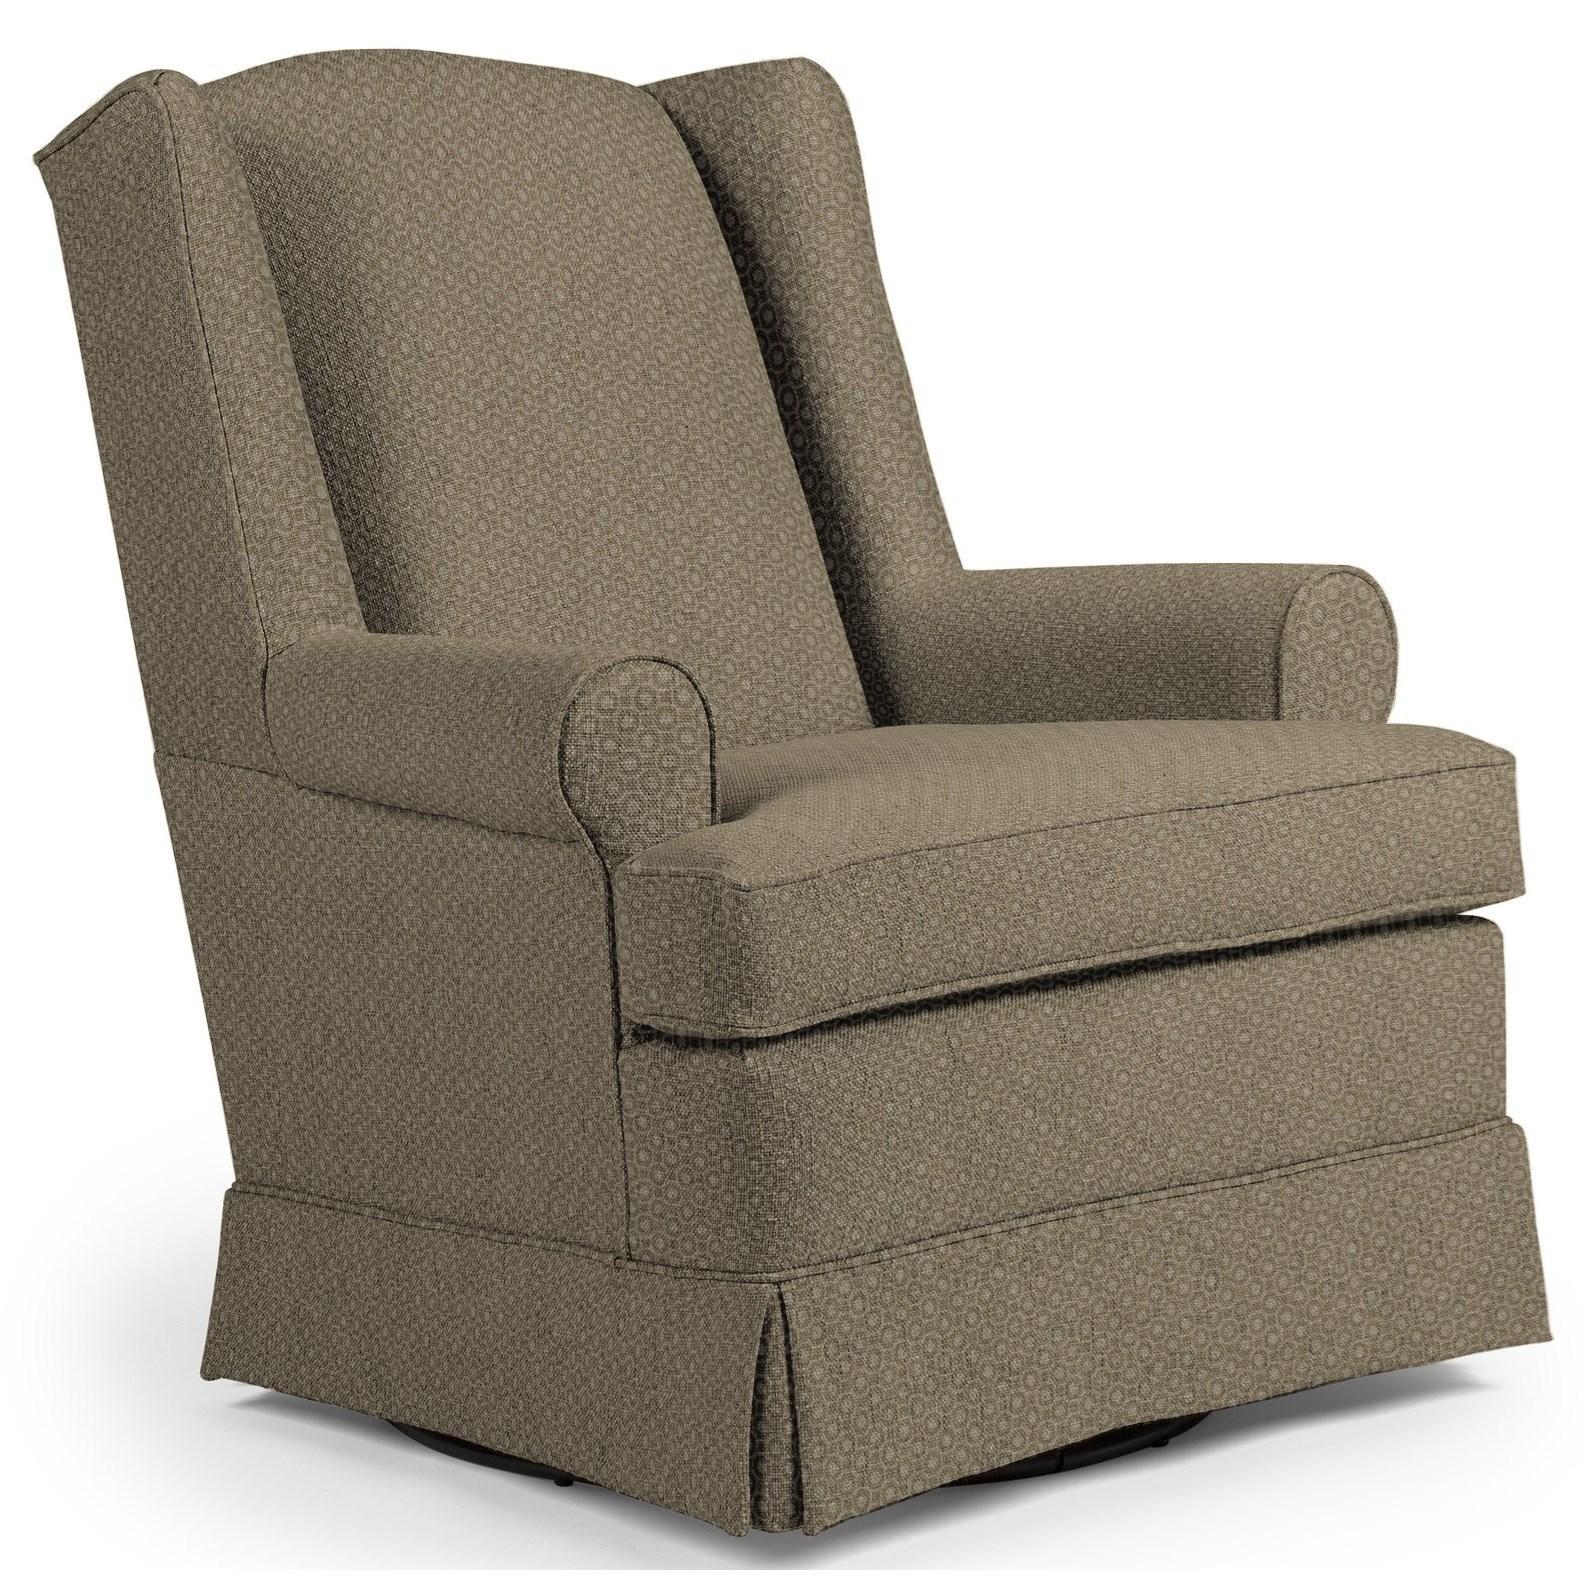 Best Home Furnishings Swivel Glide Chairs Roni Skirted Swivel Glider Chair